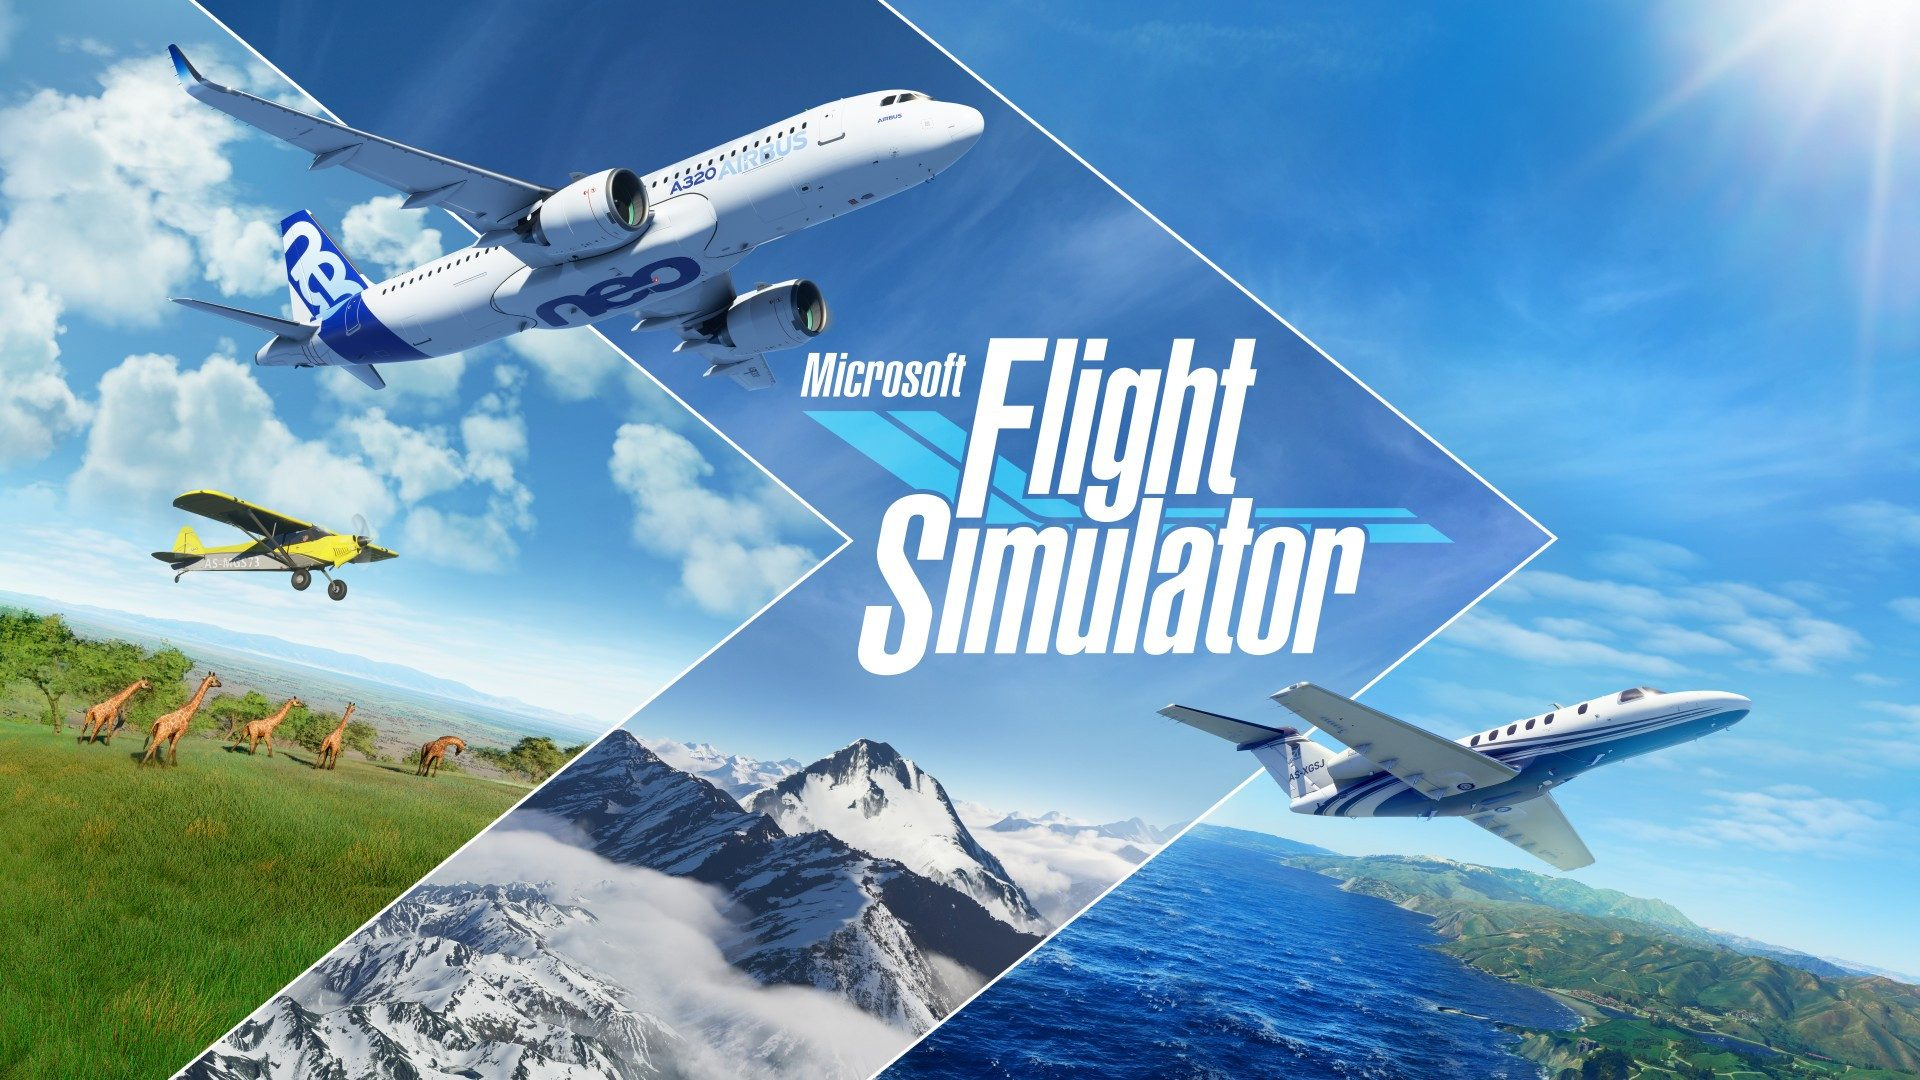 FlightSim_Vignette